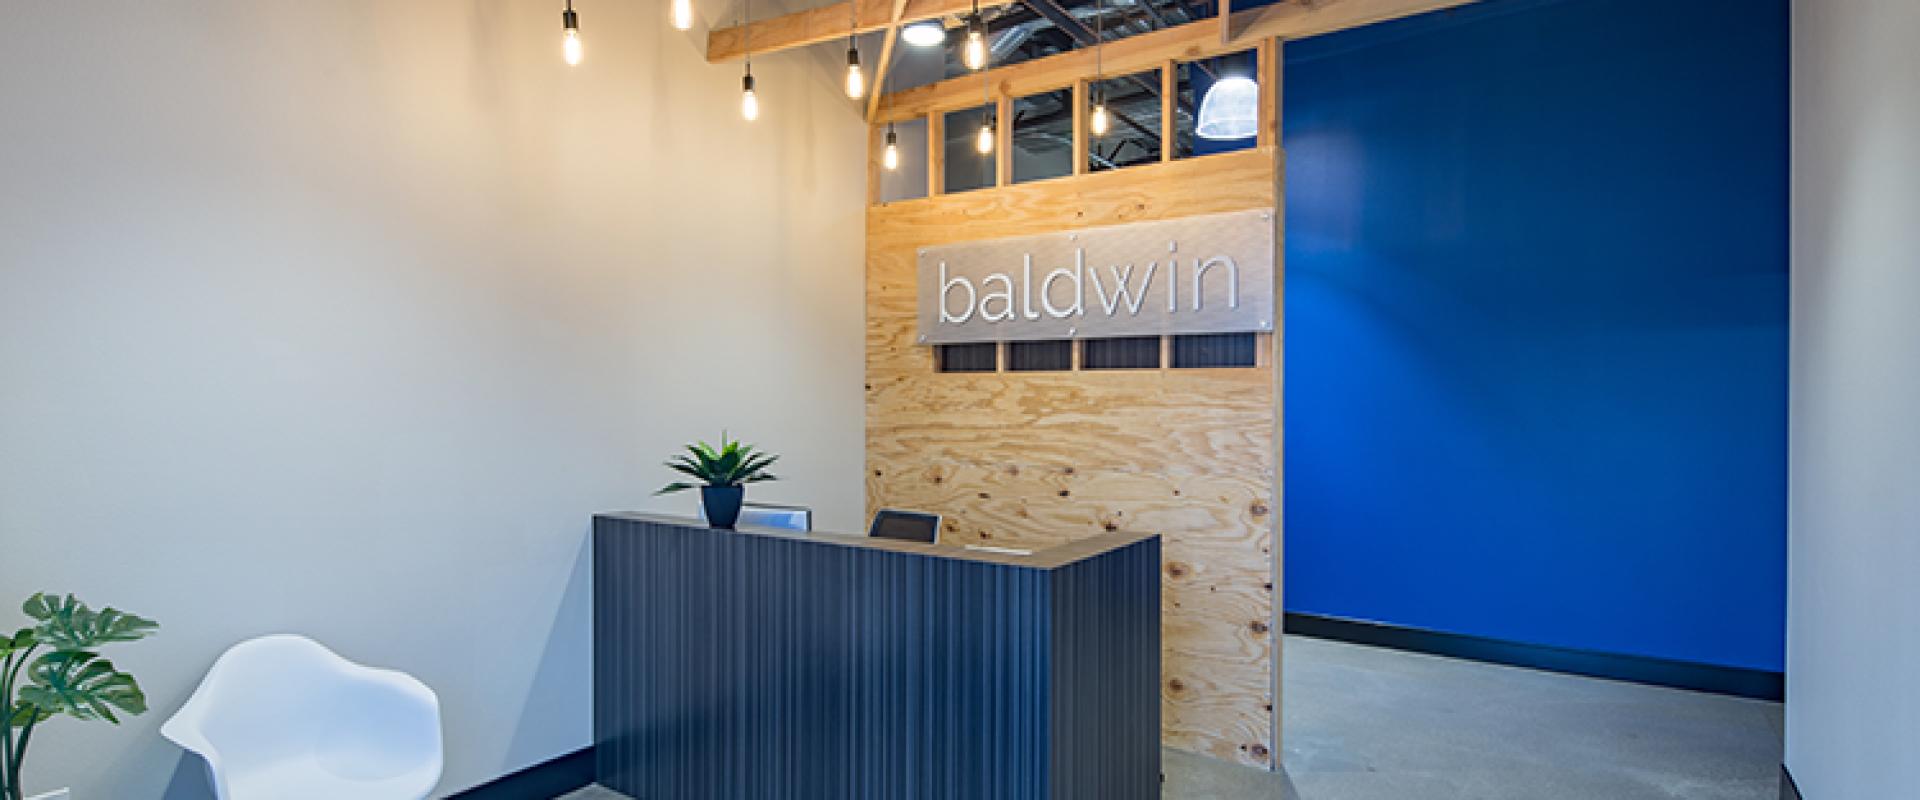 Baldwin_1